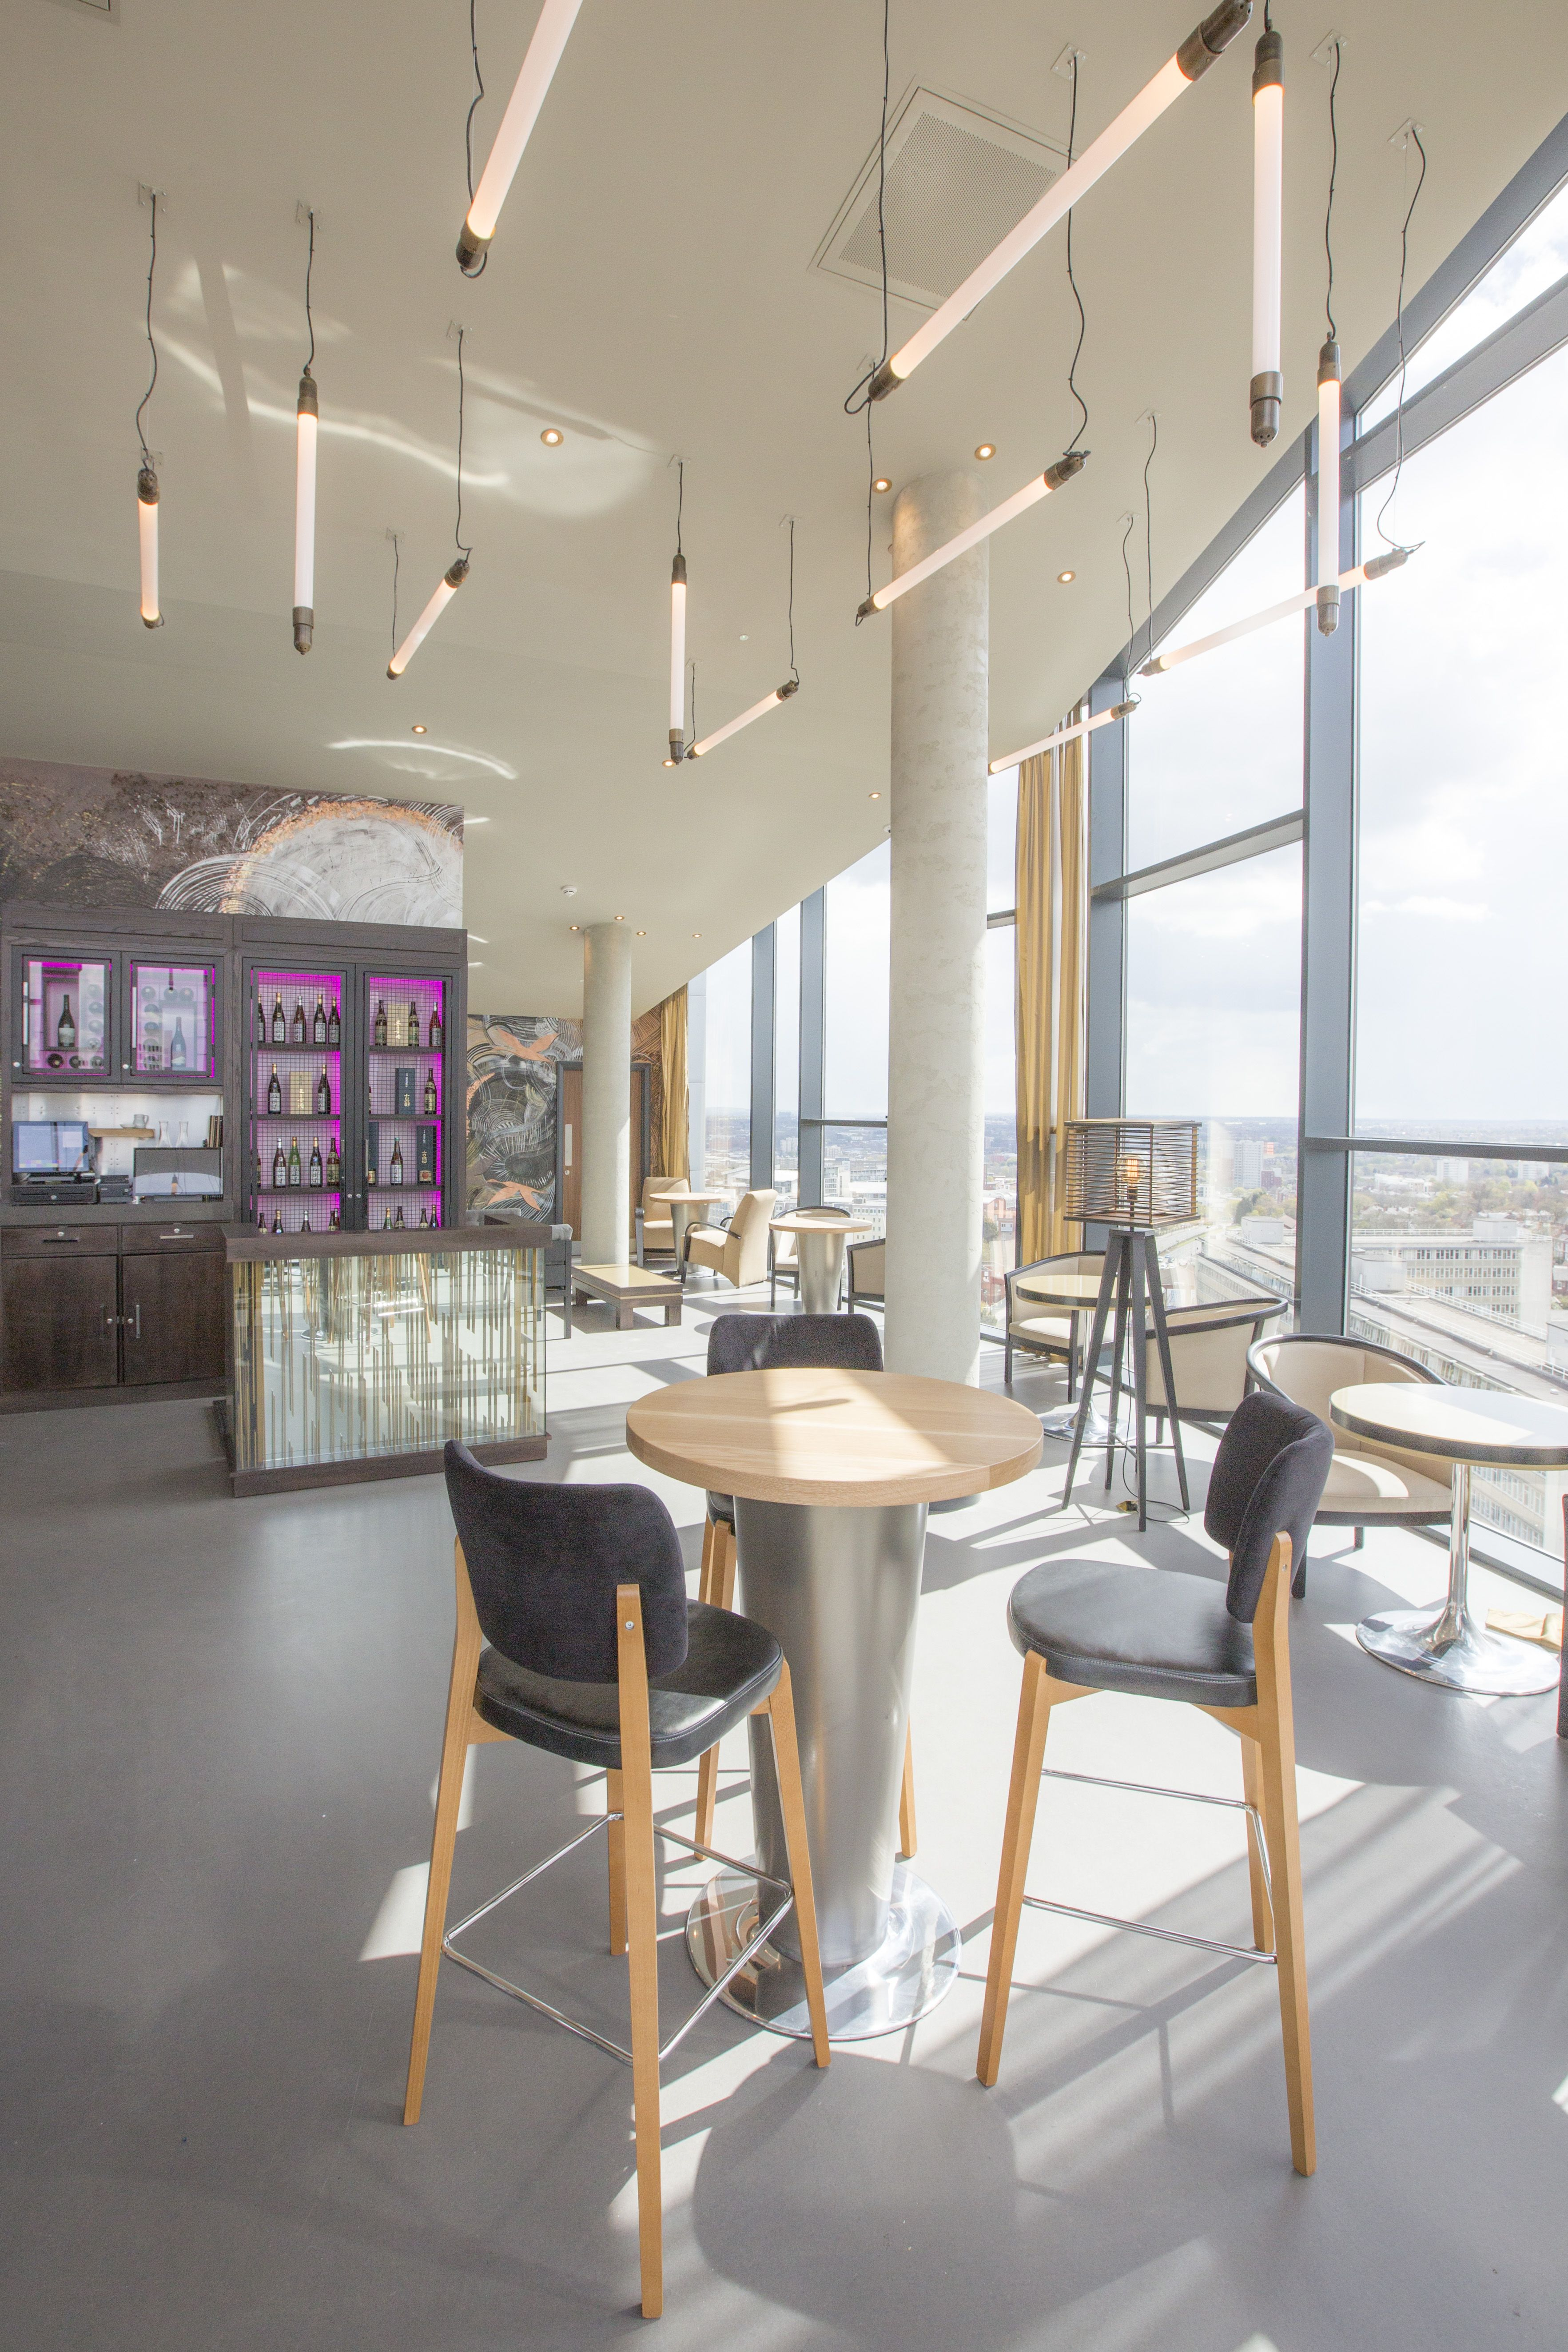 asian pendant lighting. Sky Bar - Linear Pendant Tube Lighting Over Asian Inspired Cool Furniture. Purple Neon Glow